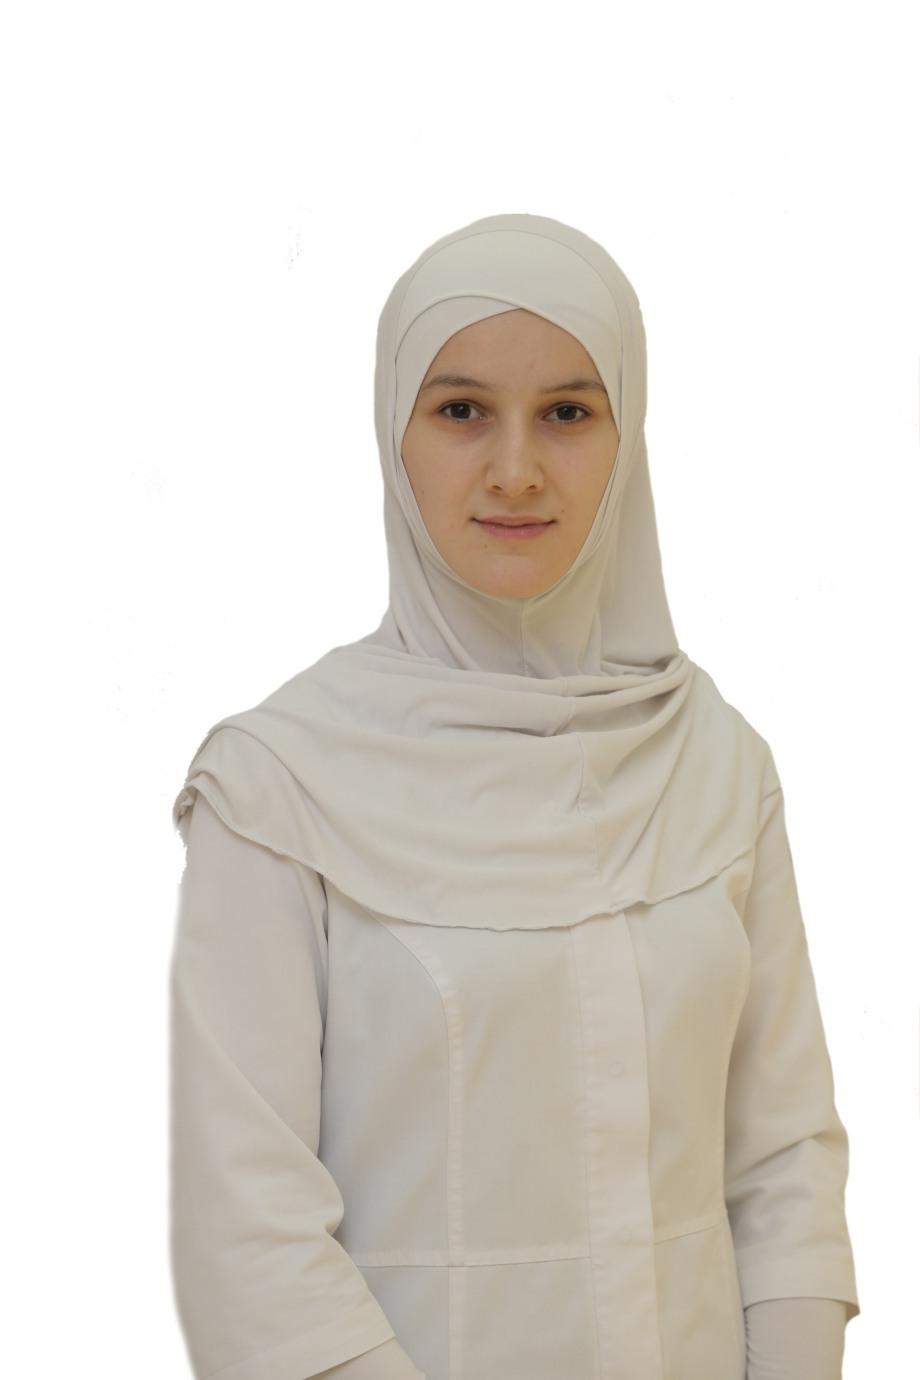 Султанахмедова Маликат Амирхановна